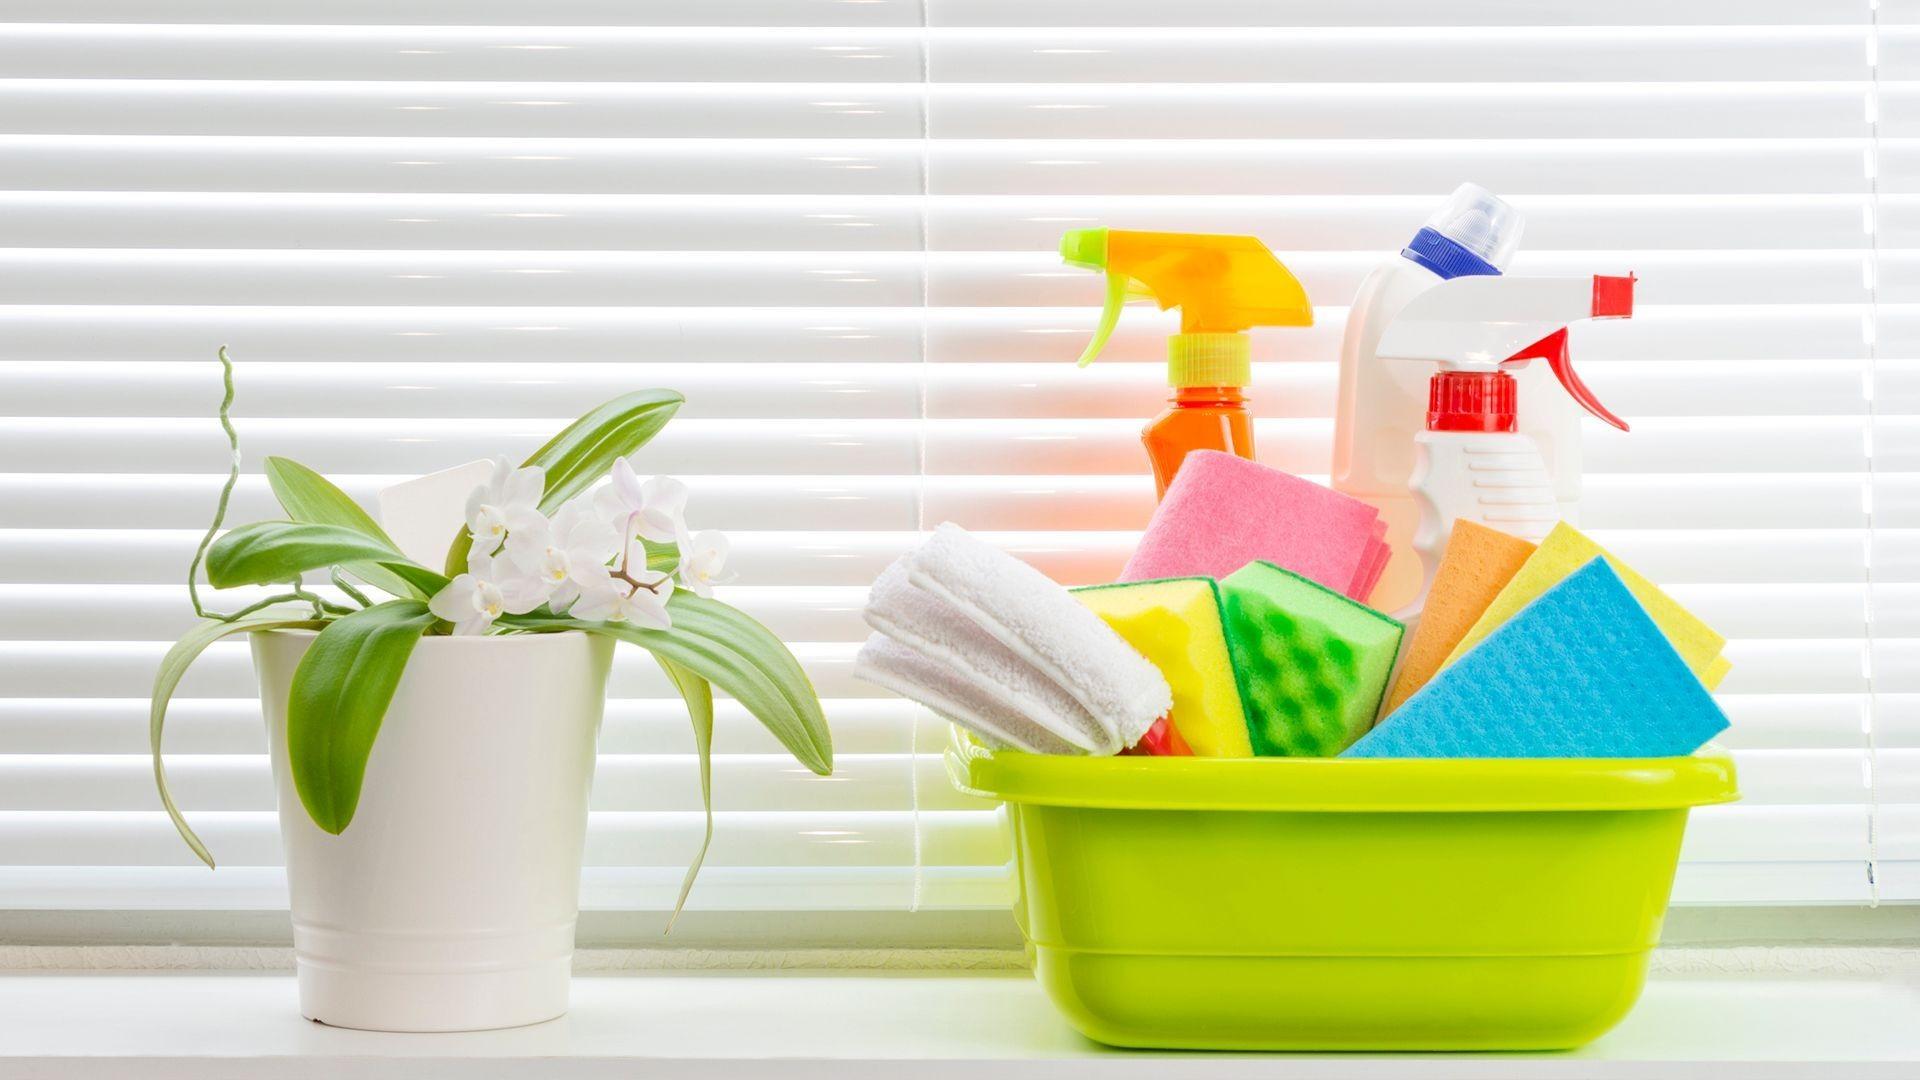 Empresa de limpieza en Tenerife